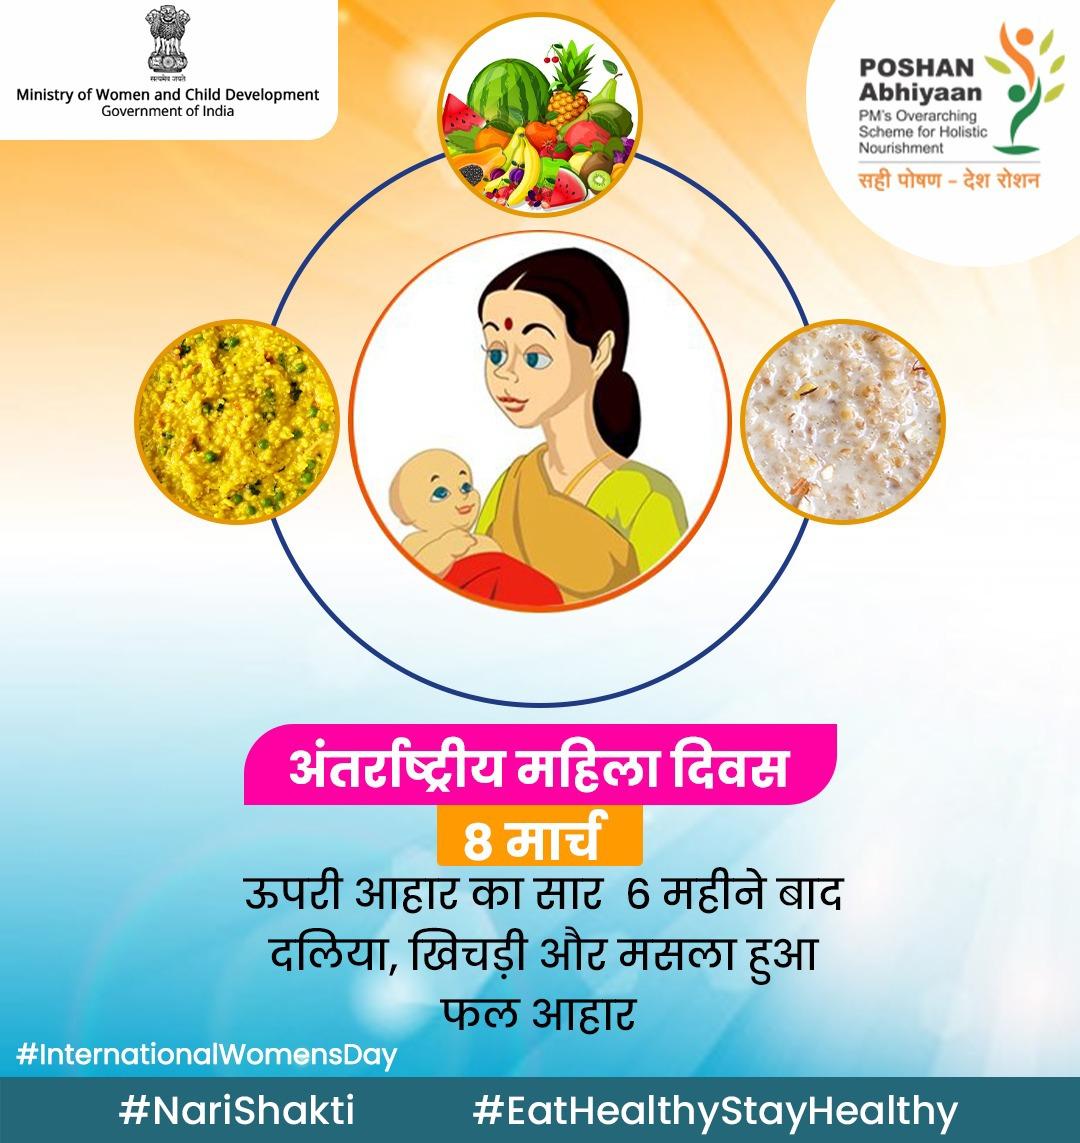 RT @MinistryWCD: #NariShakti #EatHealthyStayHealthy #InternationalWomensDay https://t.co/x3LtJqOVnD